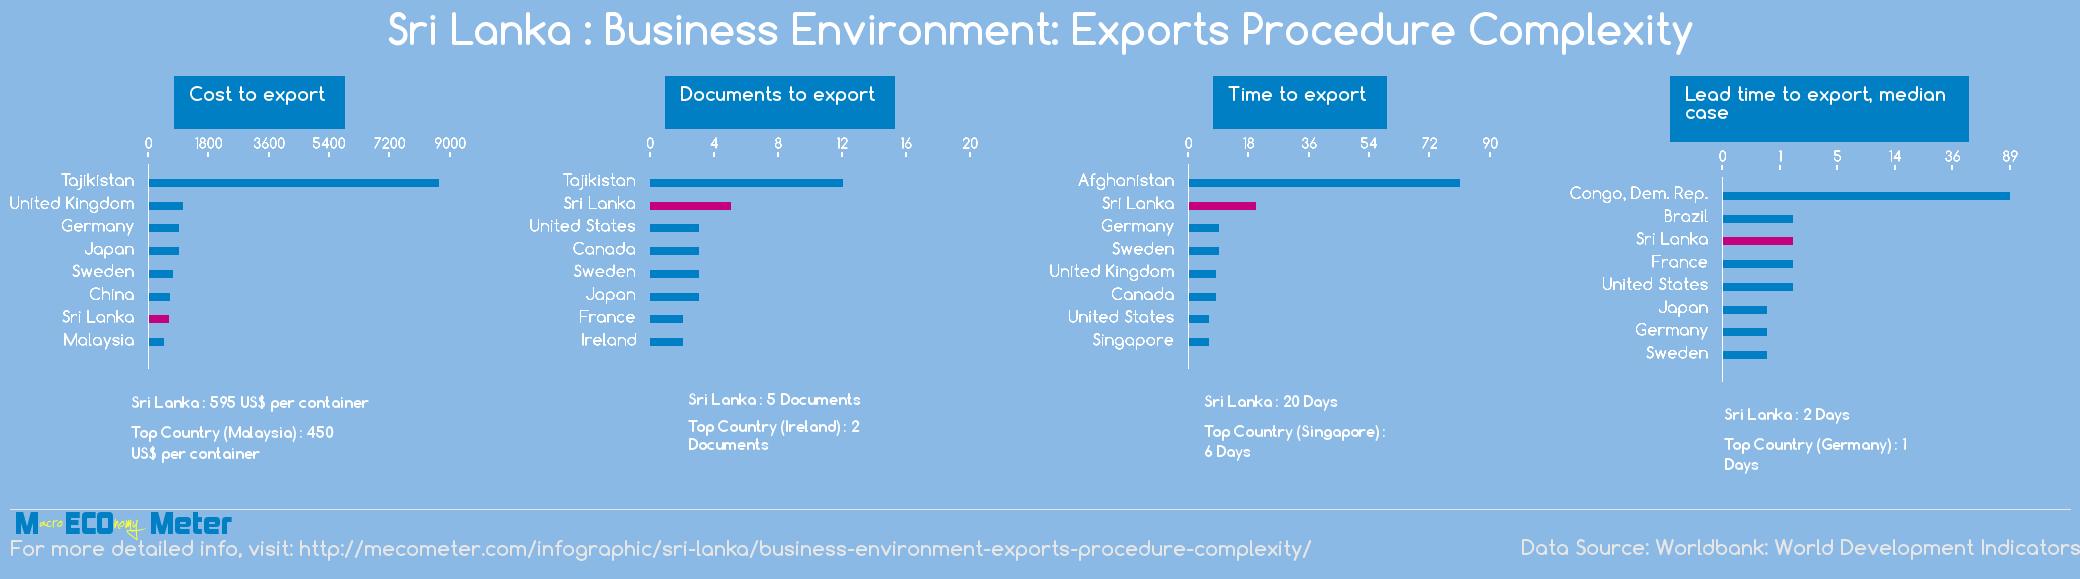 Sri Lanka : Business Environment: Exports Procedure Complexity